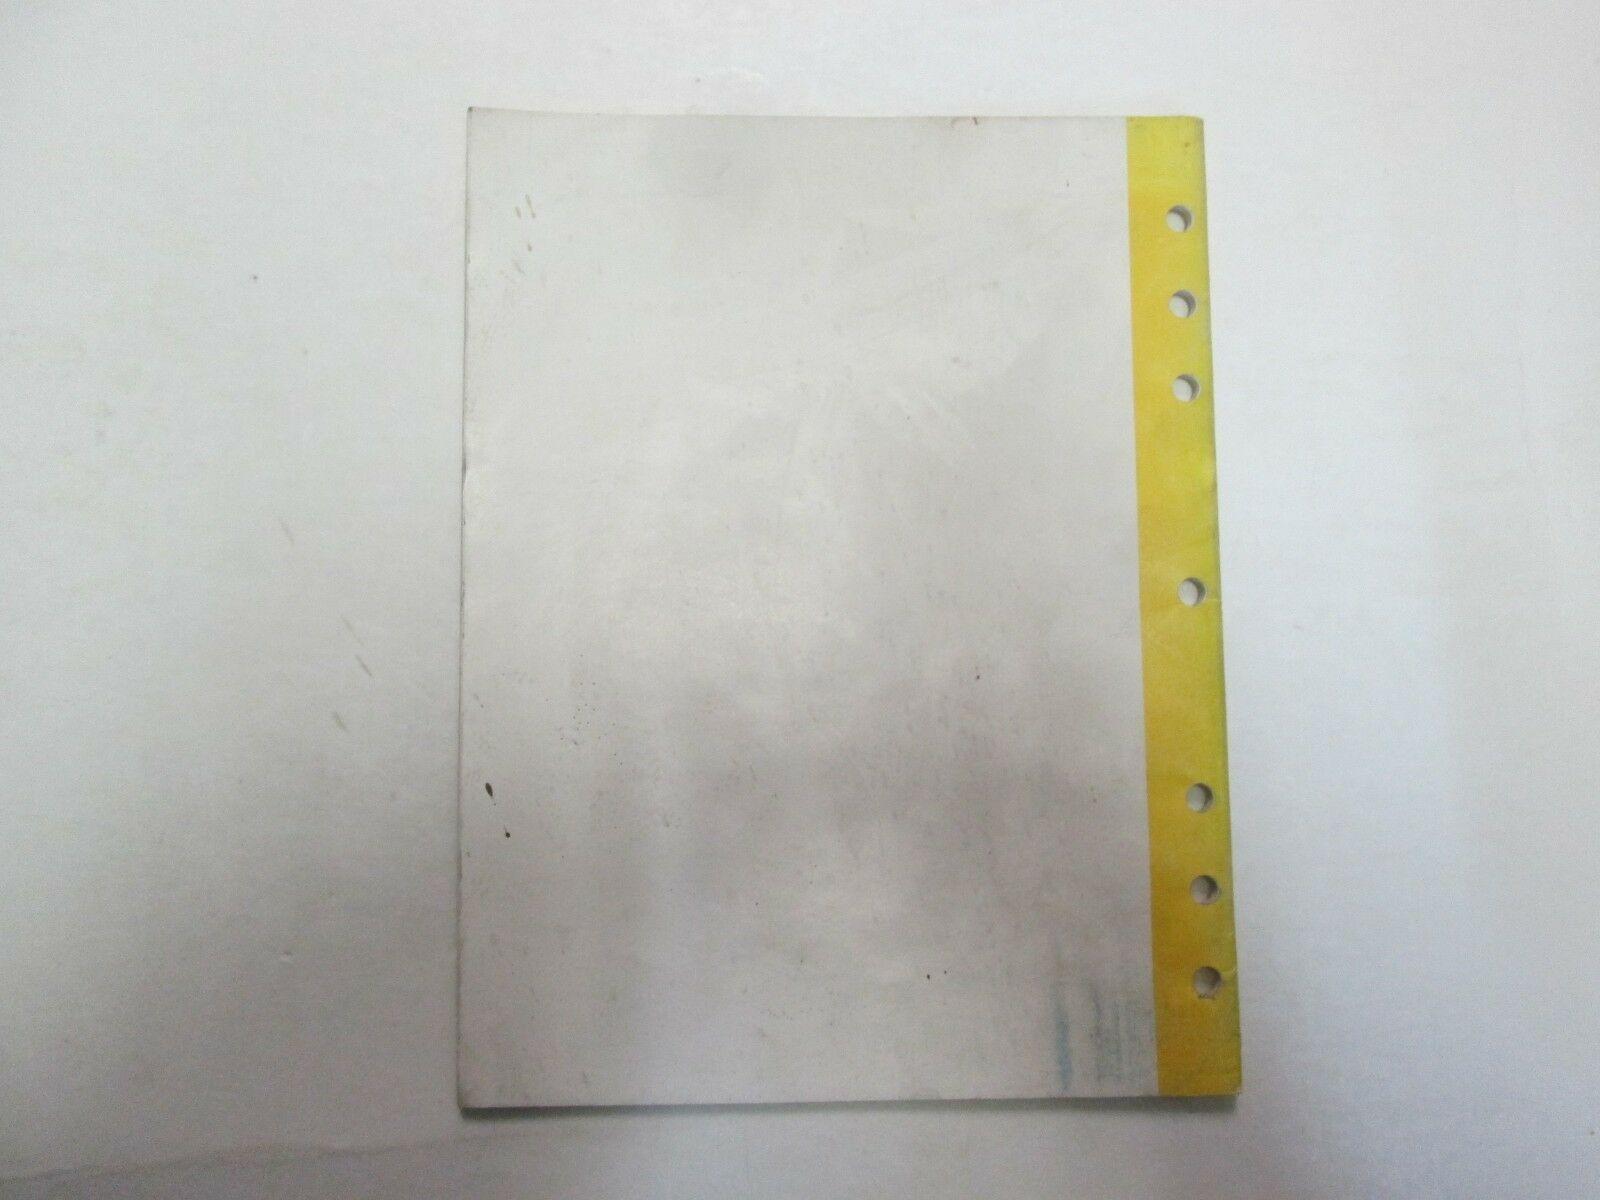 1990 Suzuki A.T.V. Motorcycle L Models Wiring Diagram Manual Factory OEM *** image 4